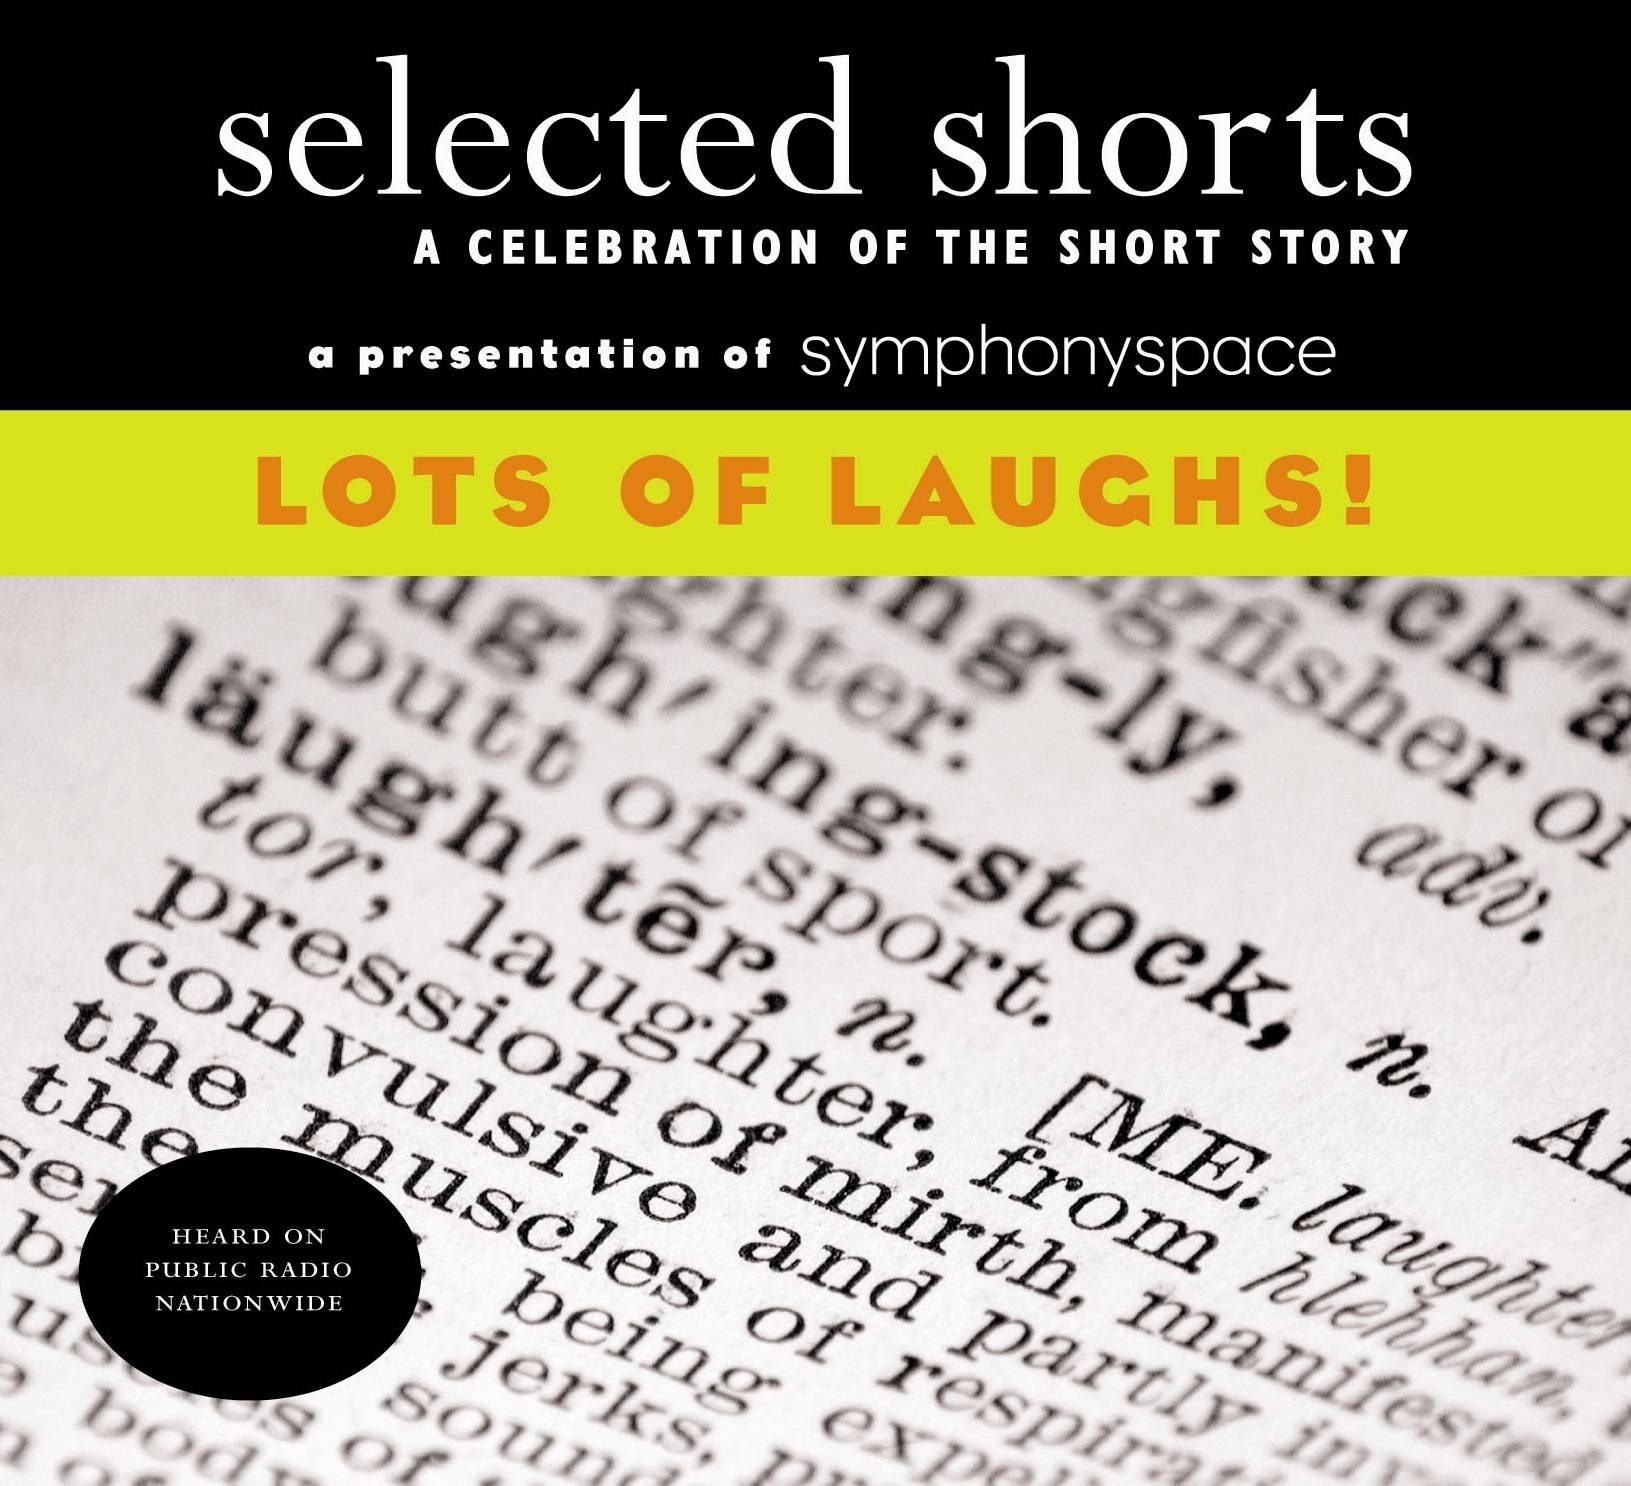 Selected Shorts Volume XVIII: Lots of Laughs! - Selected Shorts - Programs : NPR Shop